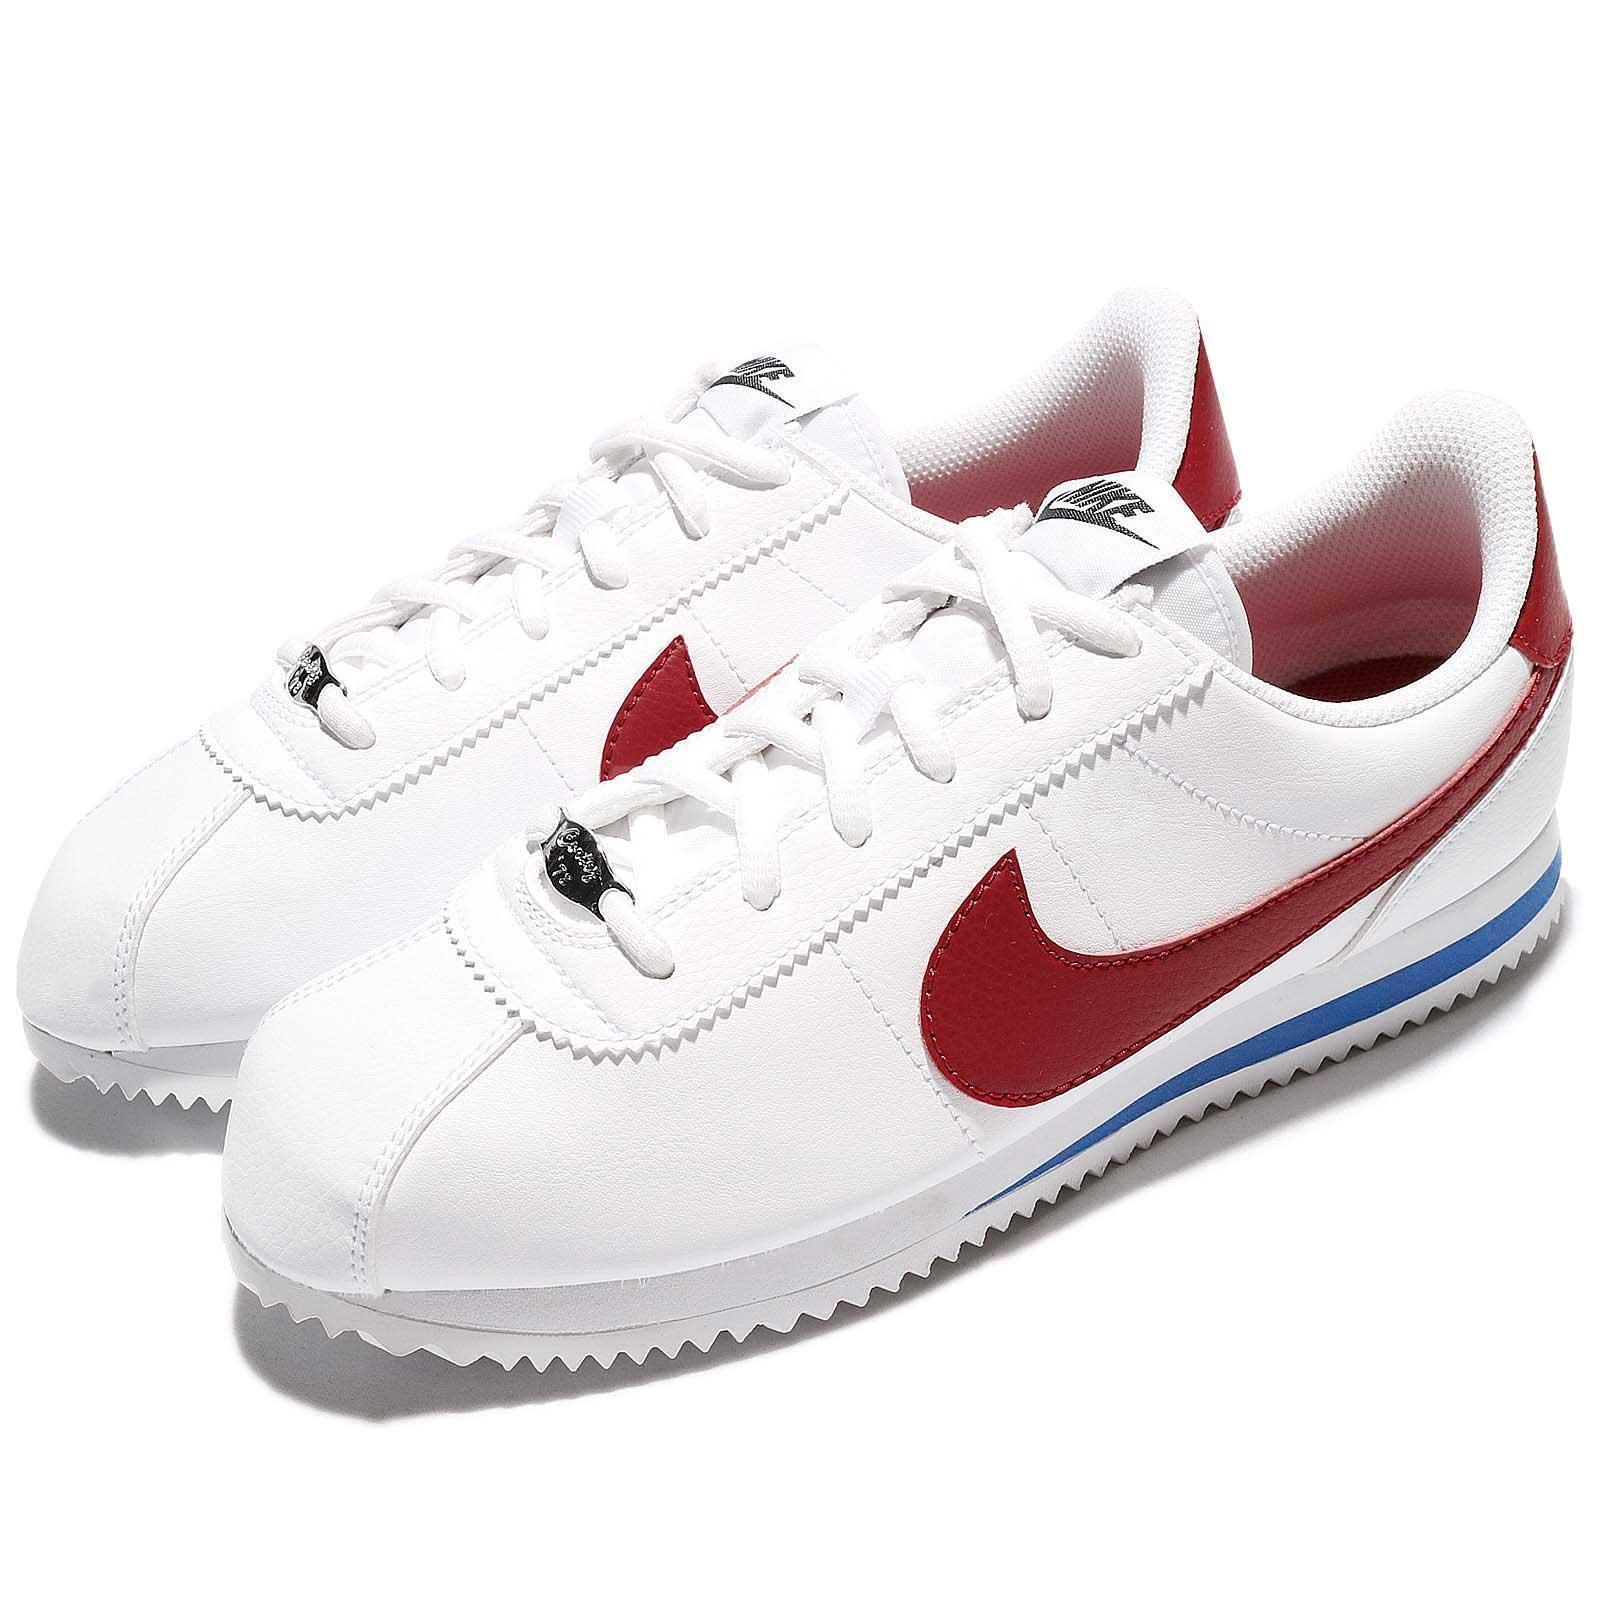 Nike Cortez Basic SL GS Forrest Gump OG Varsity Red Women Kid shoes 904764-103